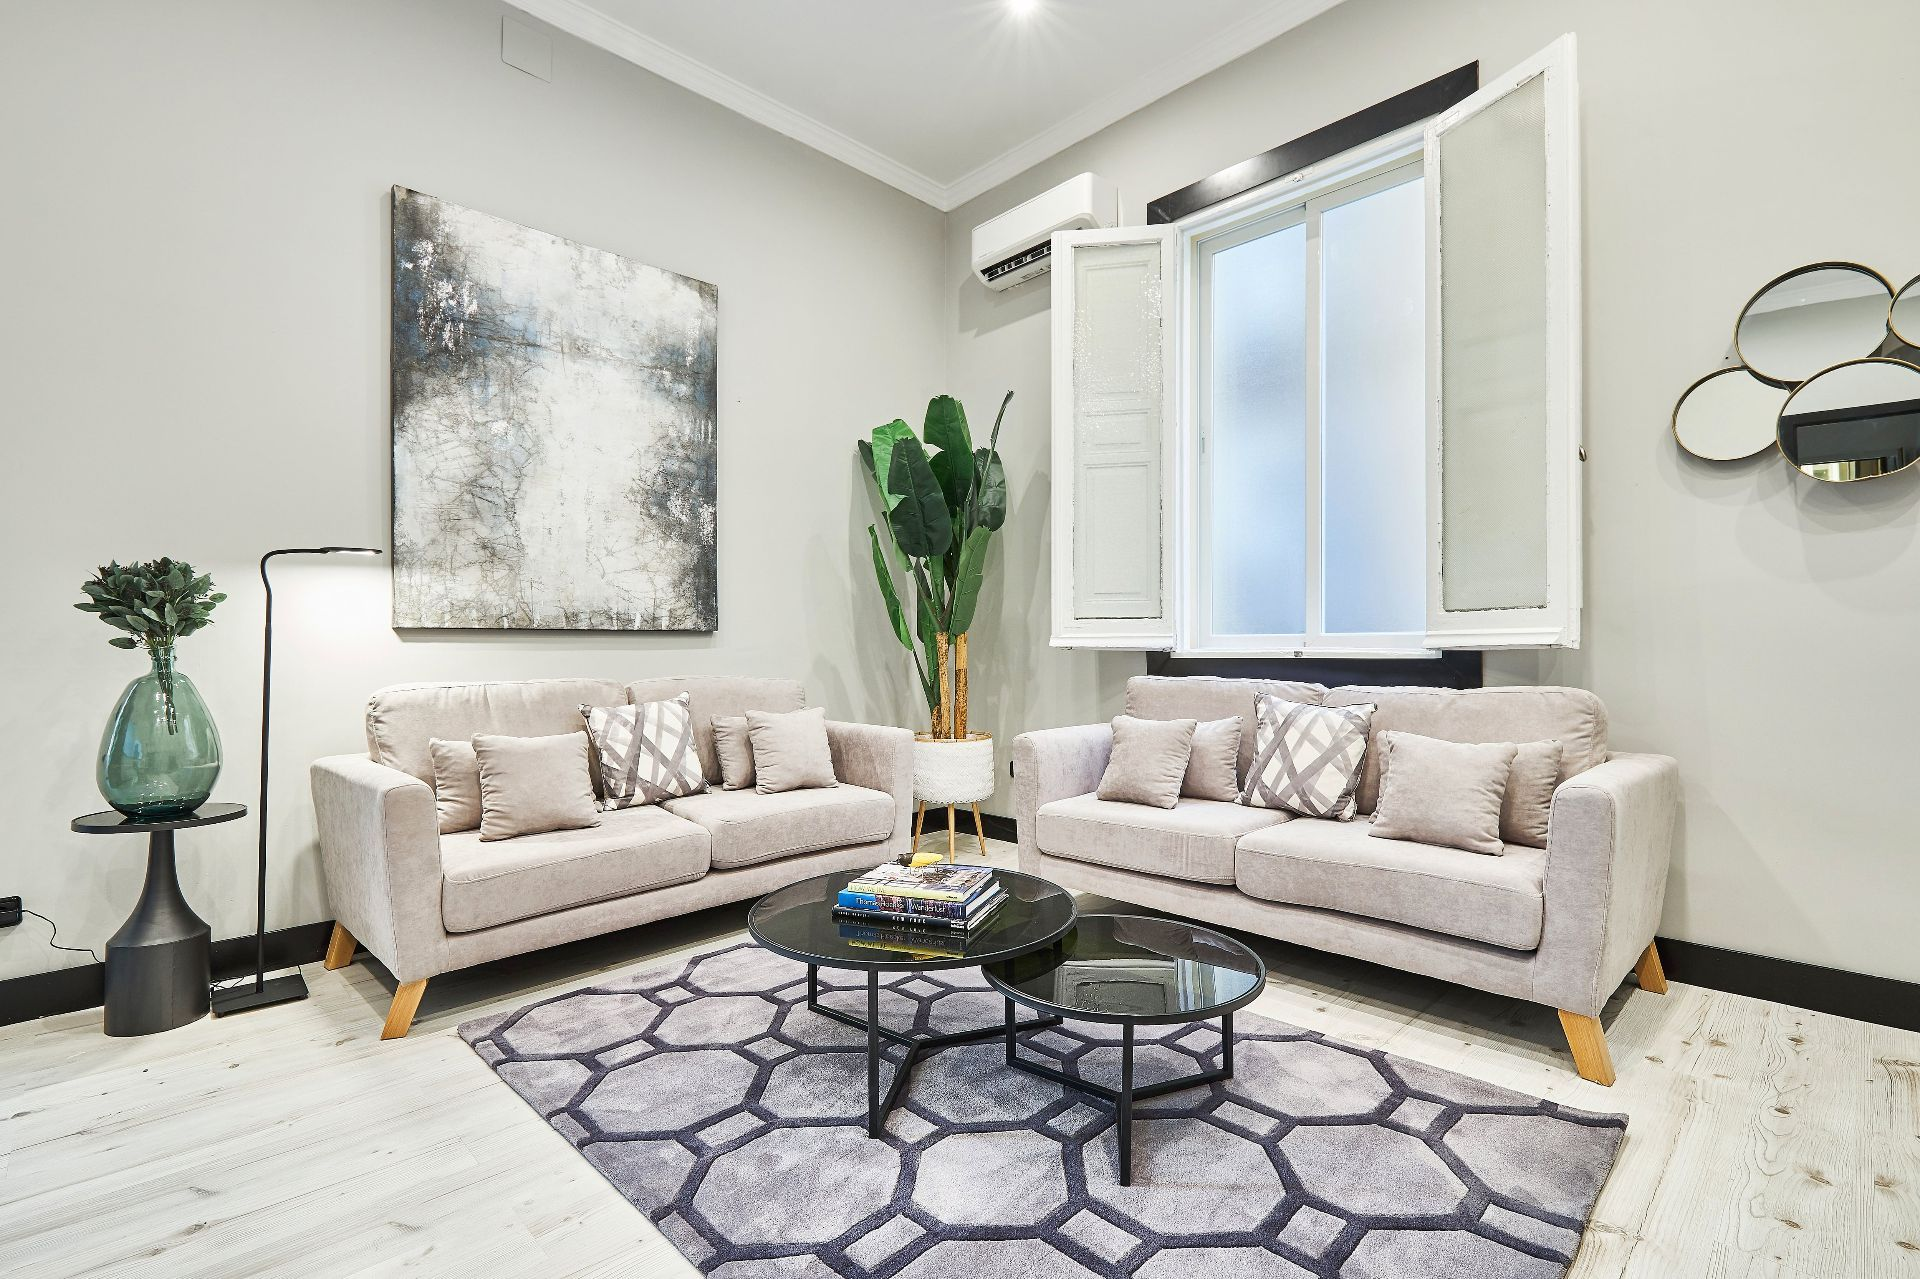 Flat in Madrid, BARRIO SALAMANCA, for rent